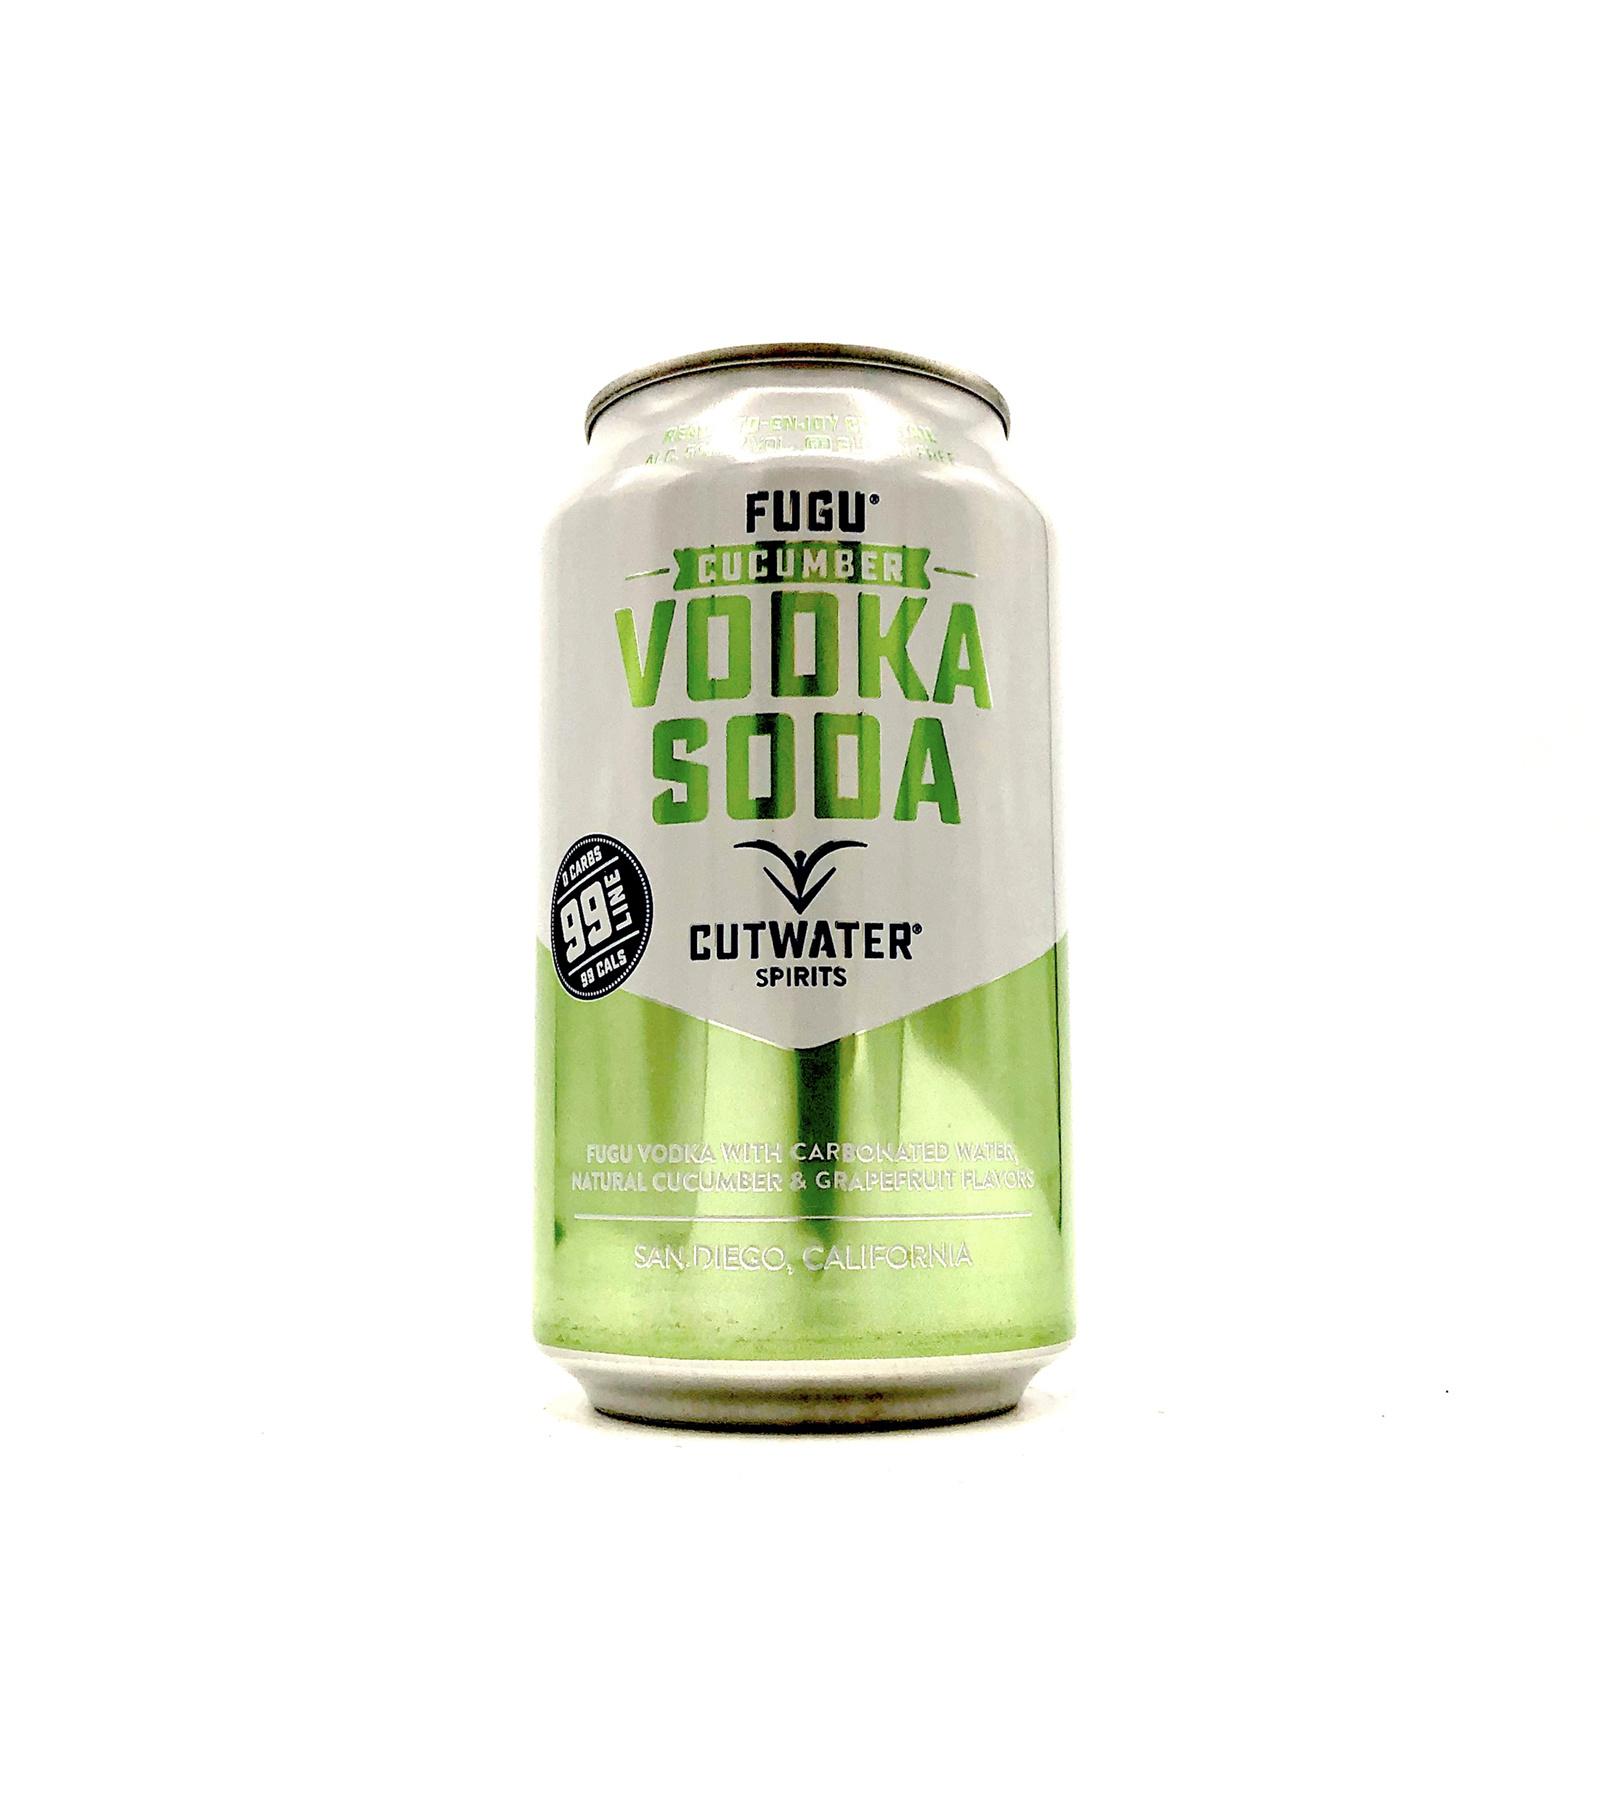 Fugu Cucumber Vodka Soda 12oz (can) Cutwater